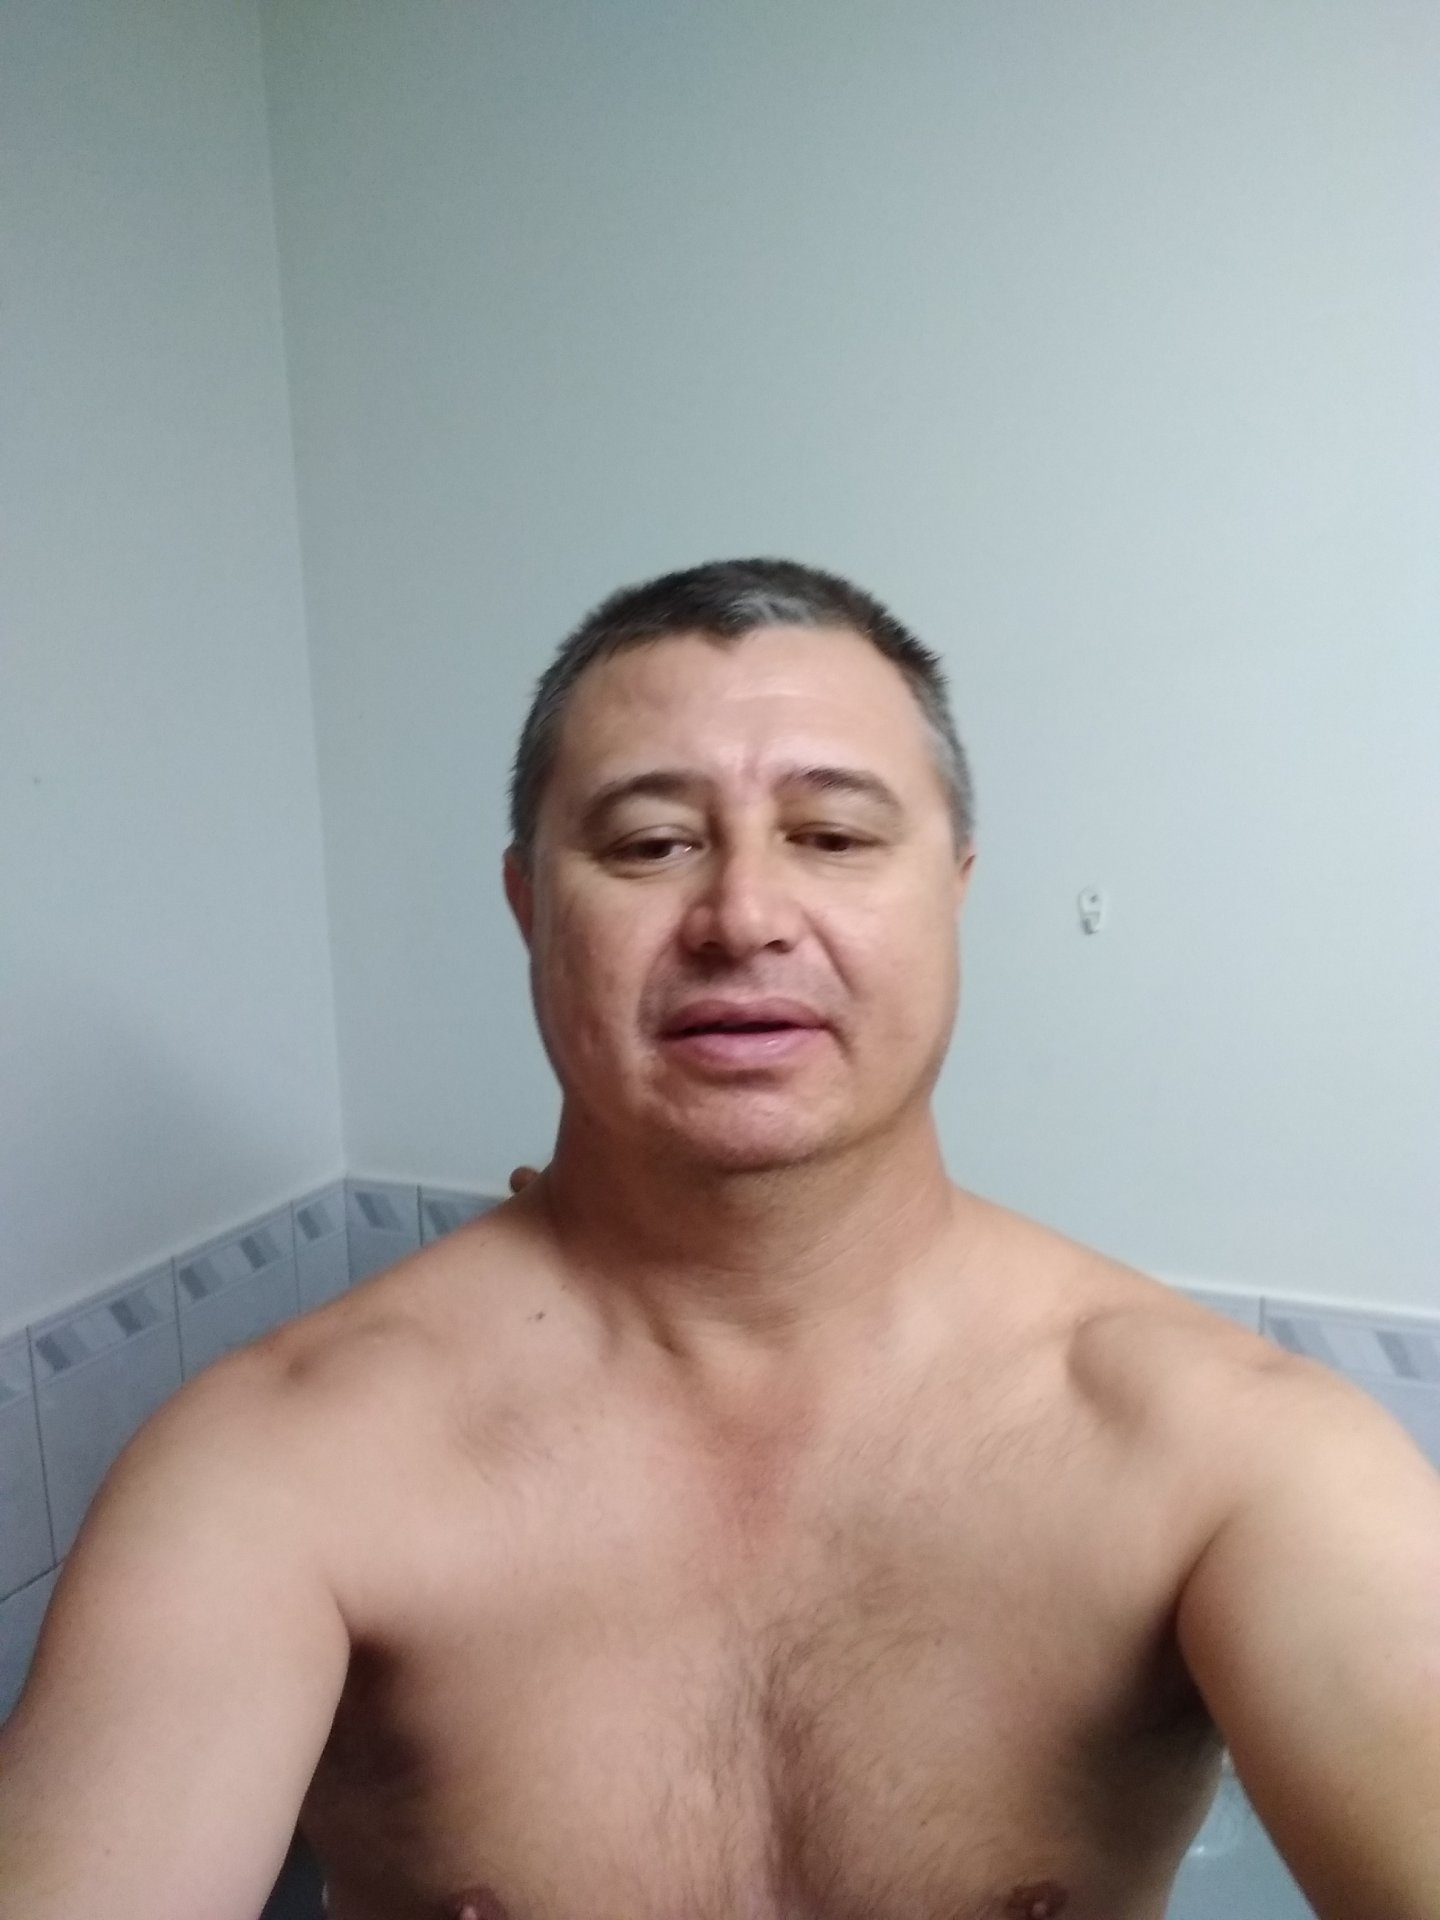 Freddo from Australian Capital Territory,Australia